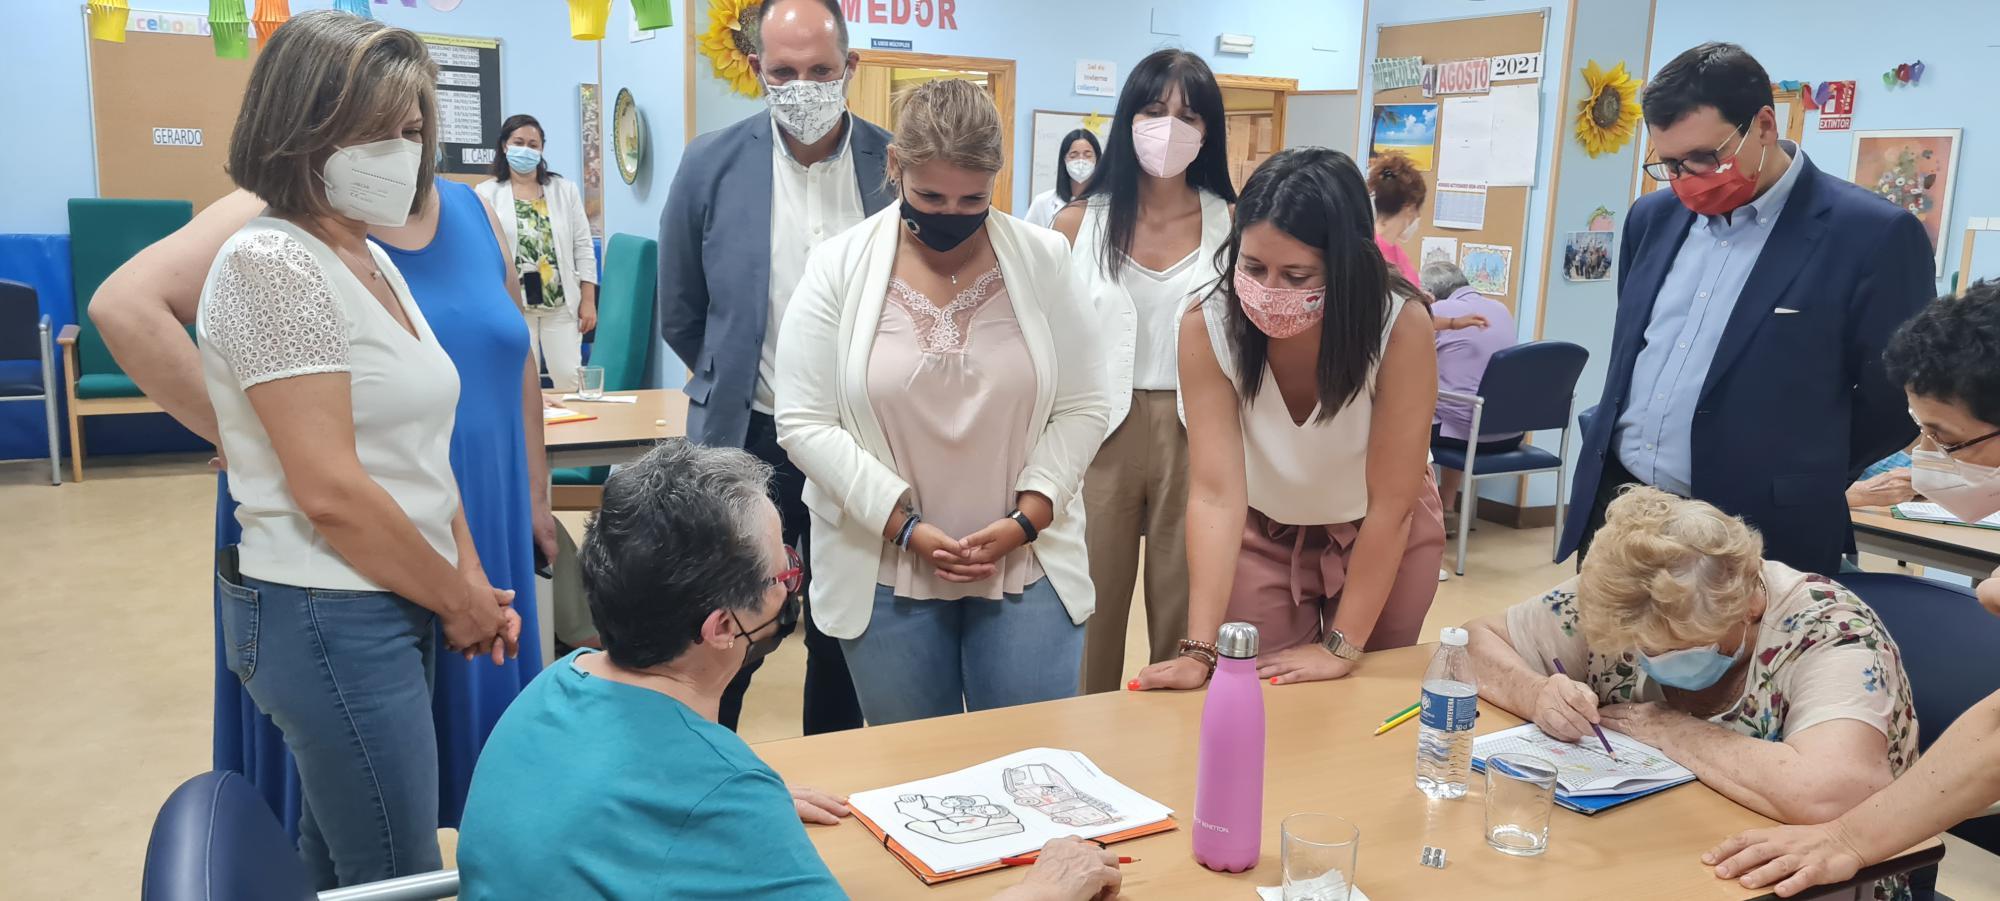 La alcaldesa elogia la labor realizada por AFATA